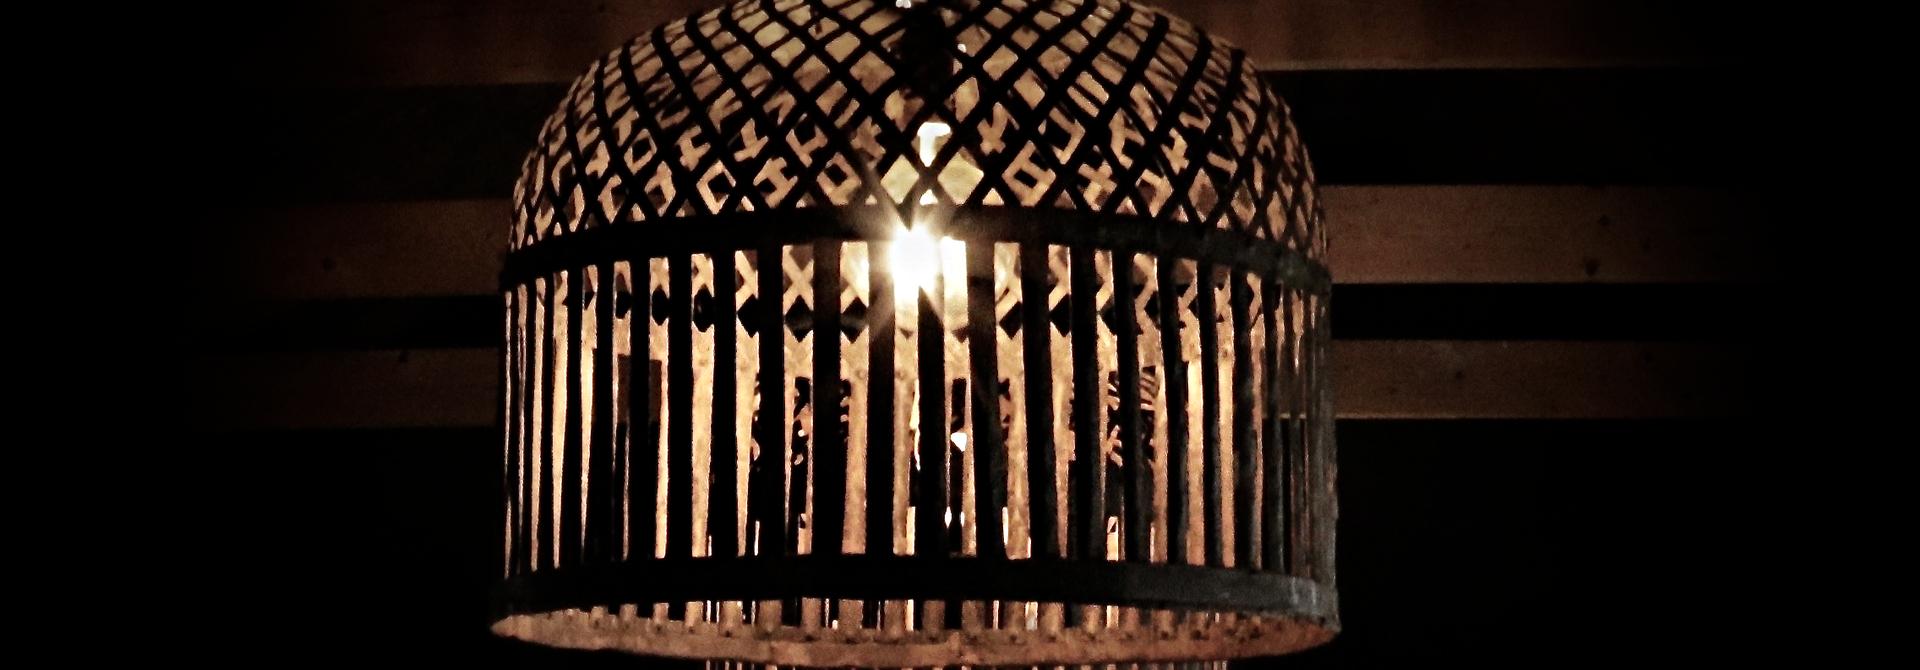 Hang Lampen